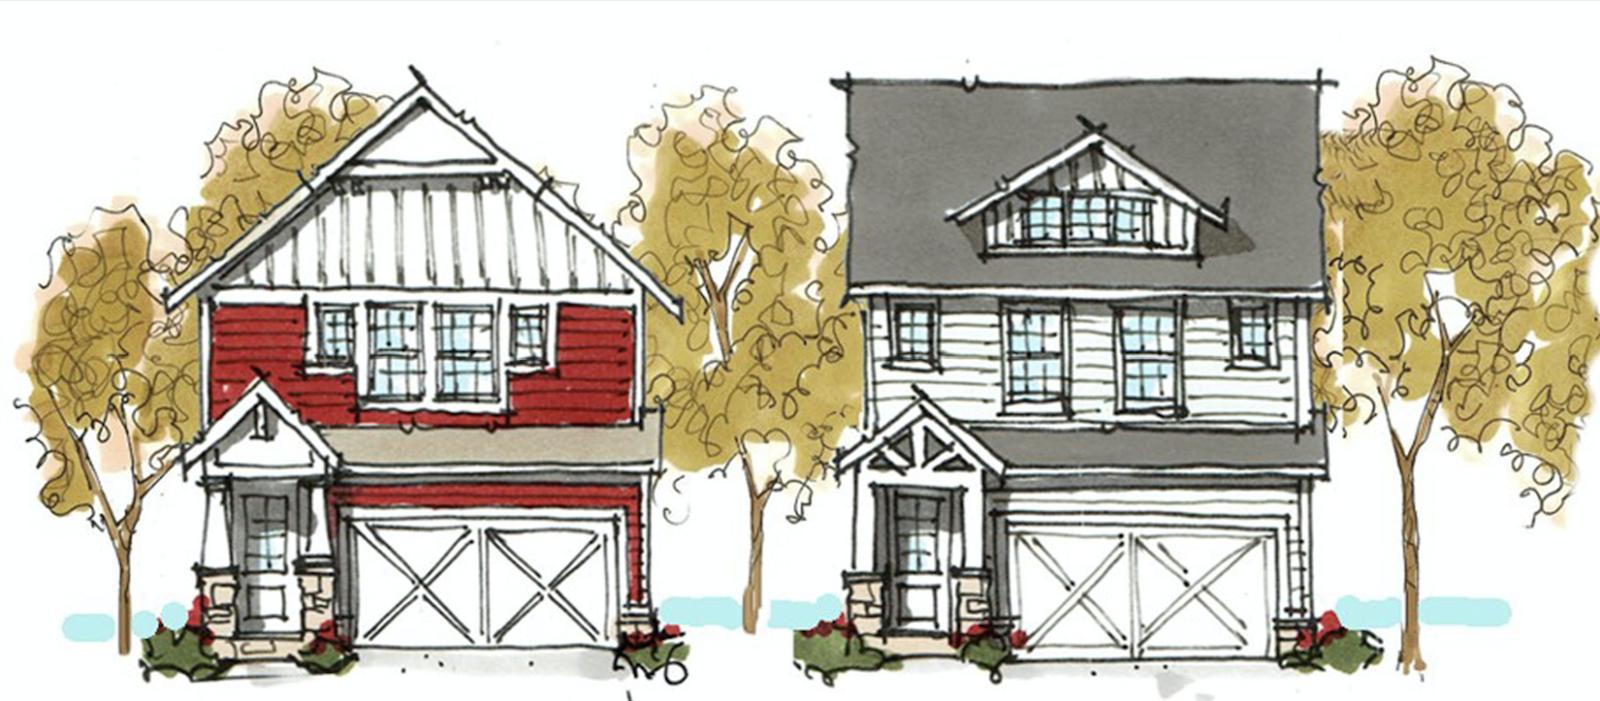 House Design One Plan Multiple Elevations Pro Builder